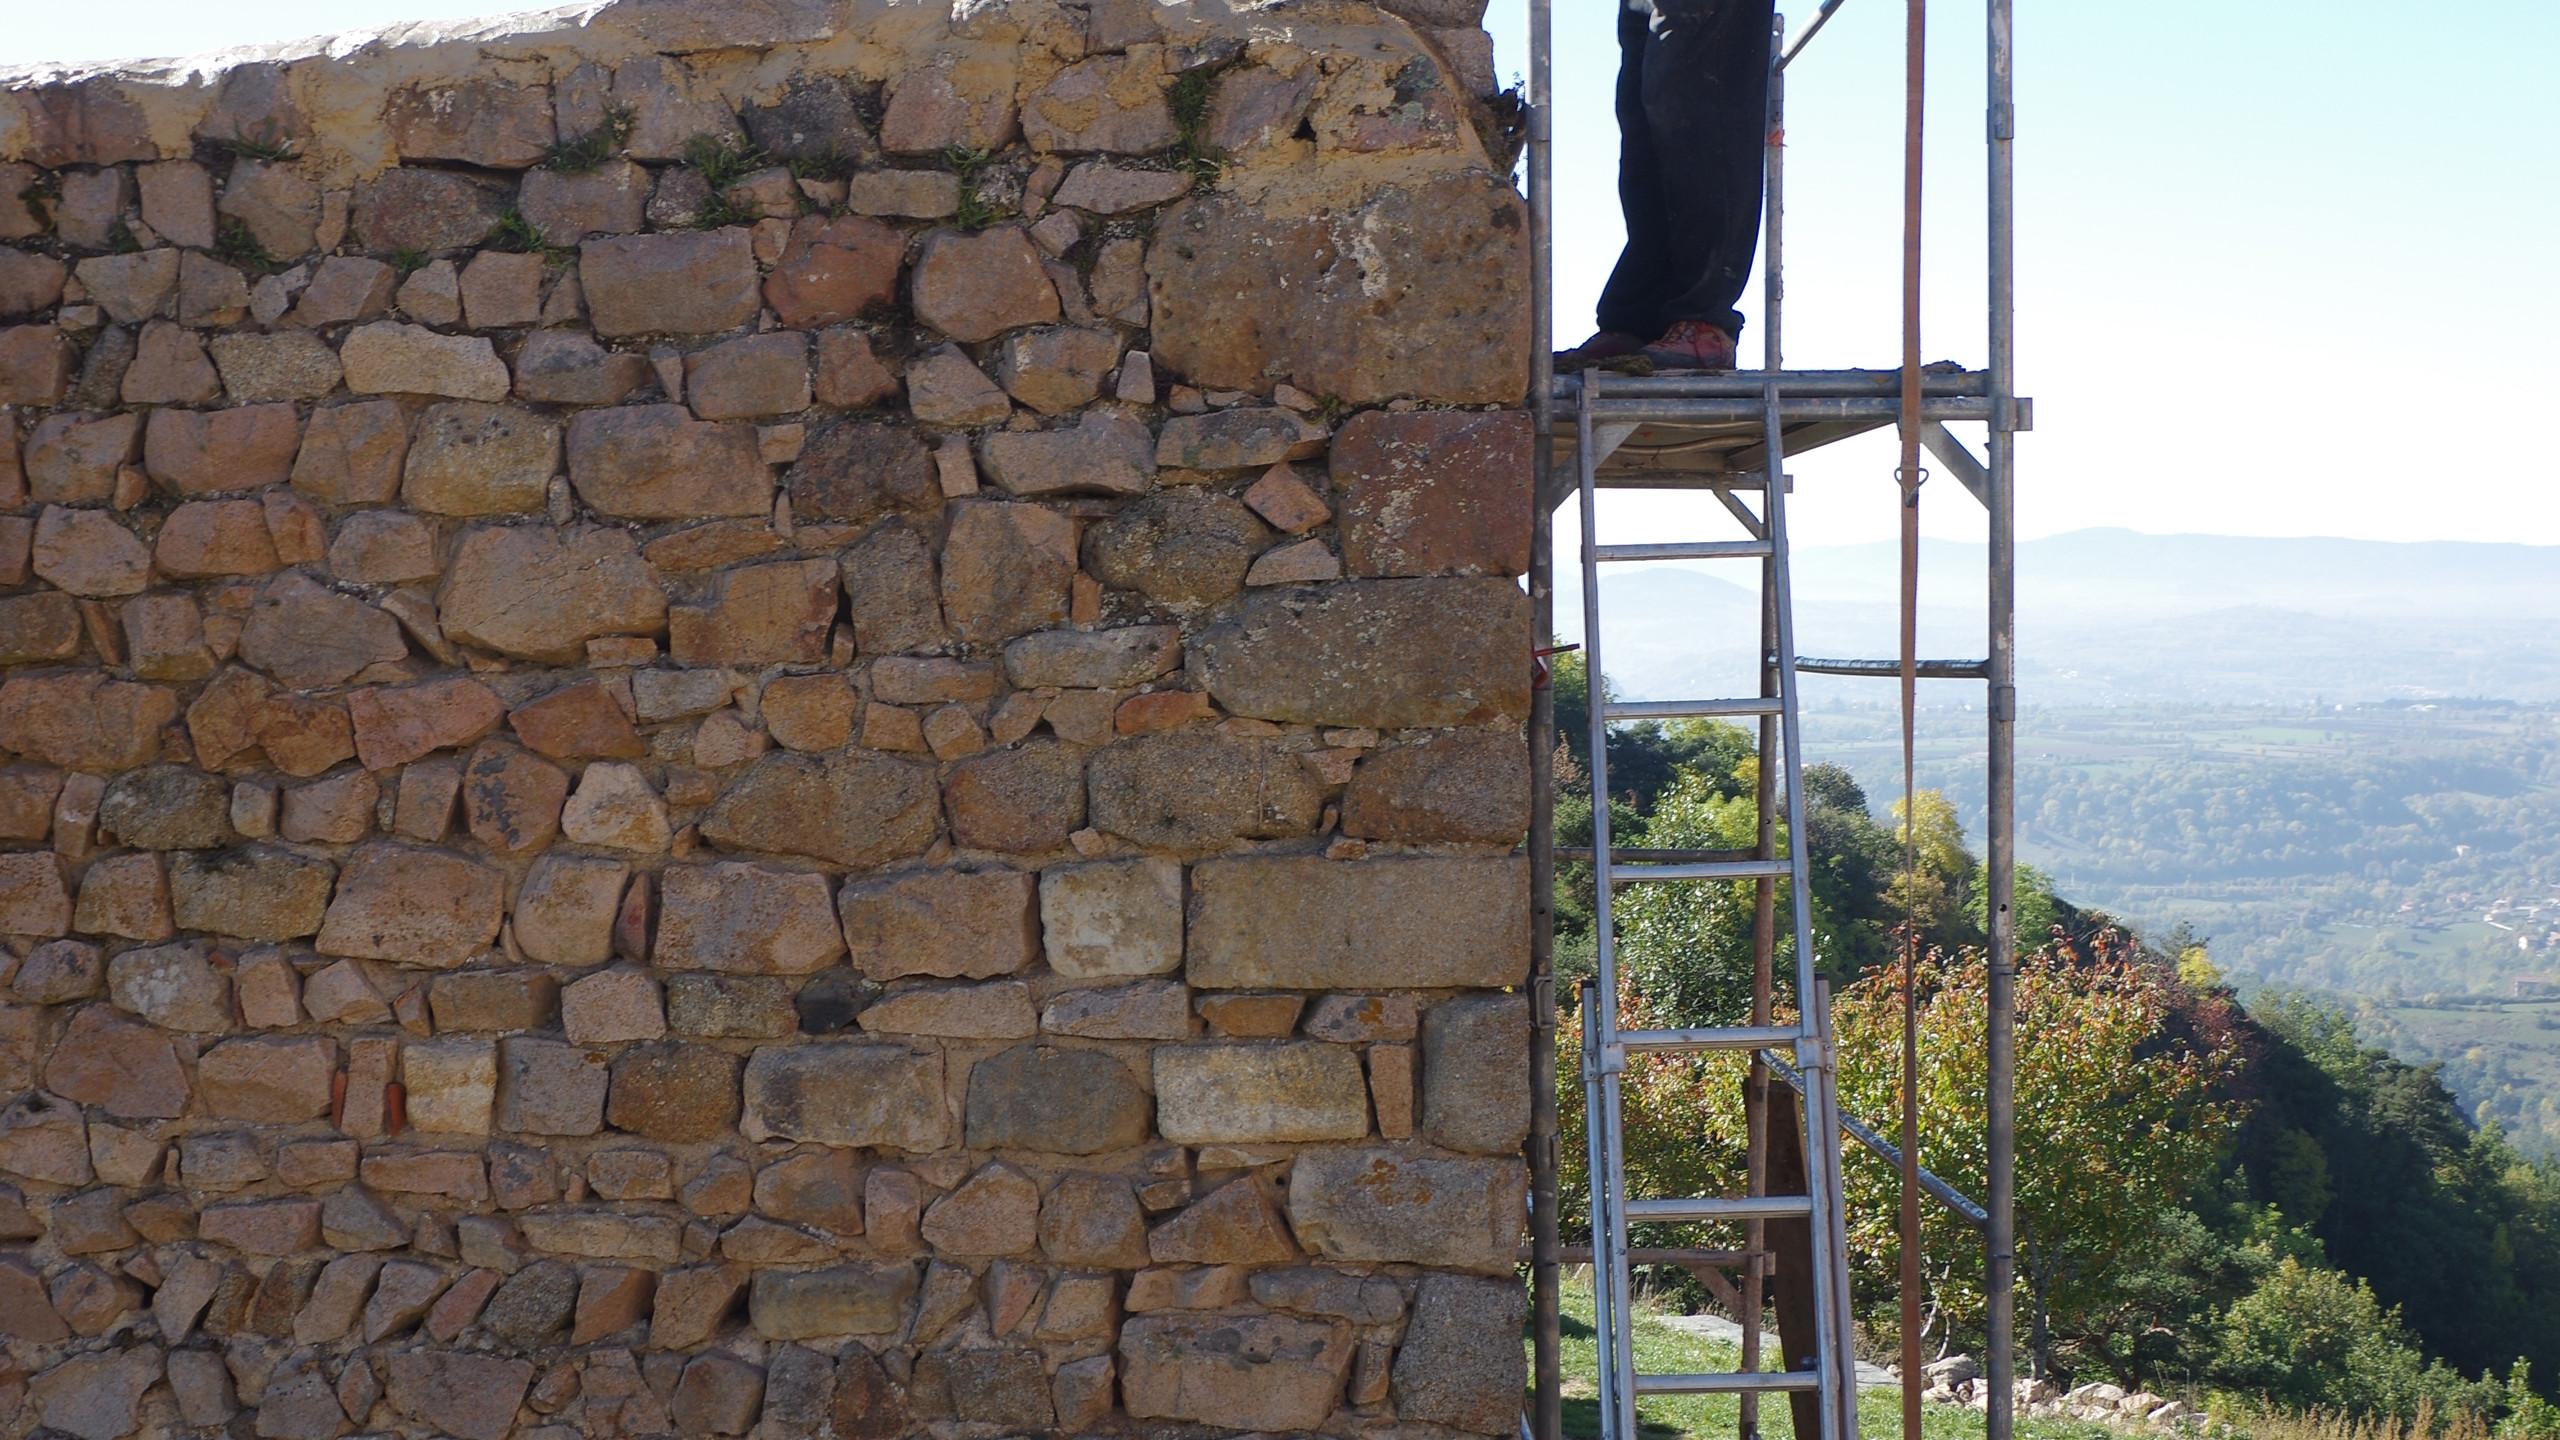 Cristallisation du mur